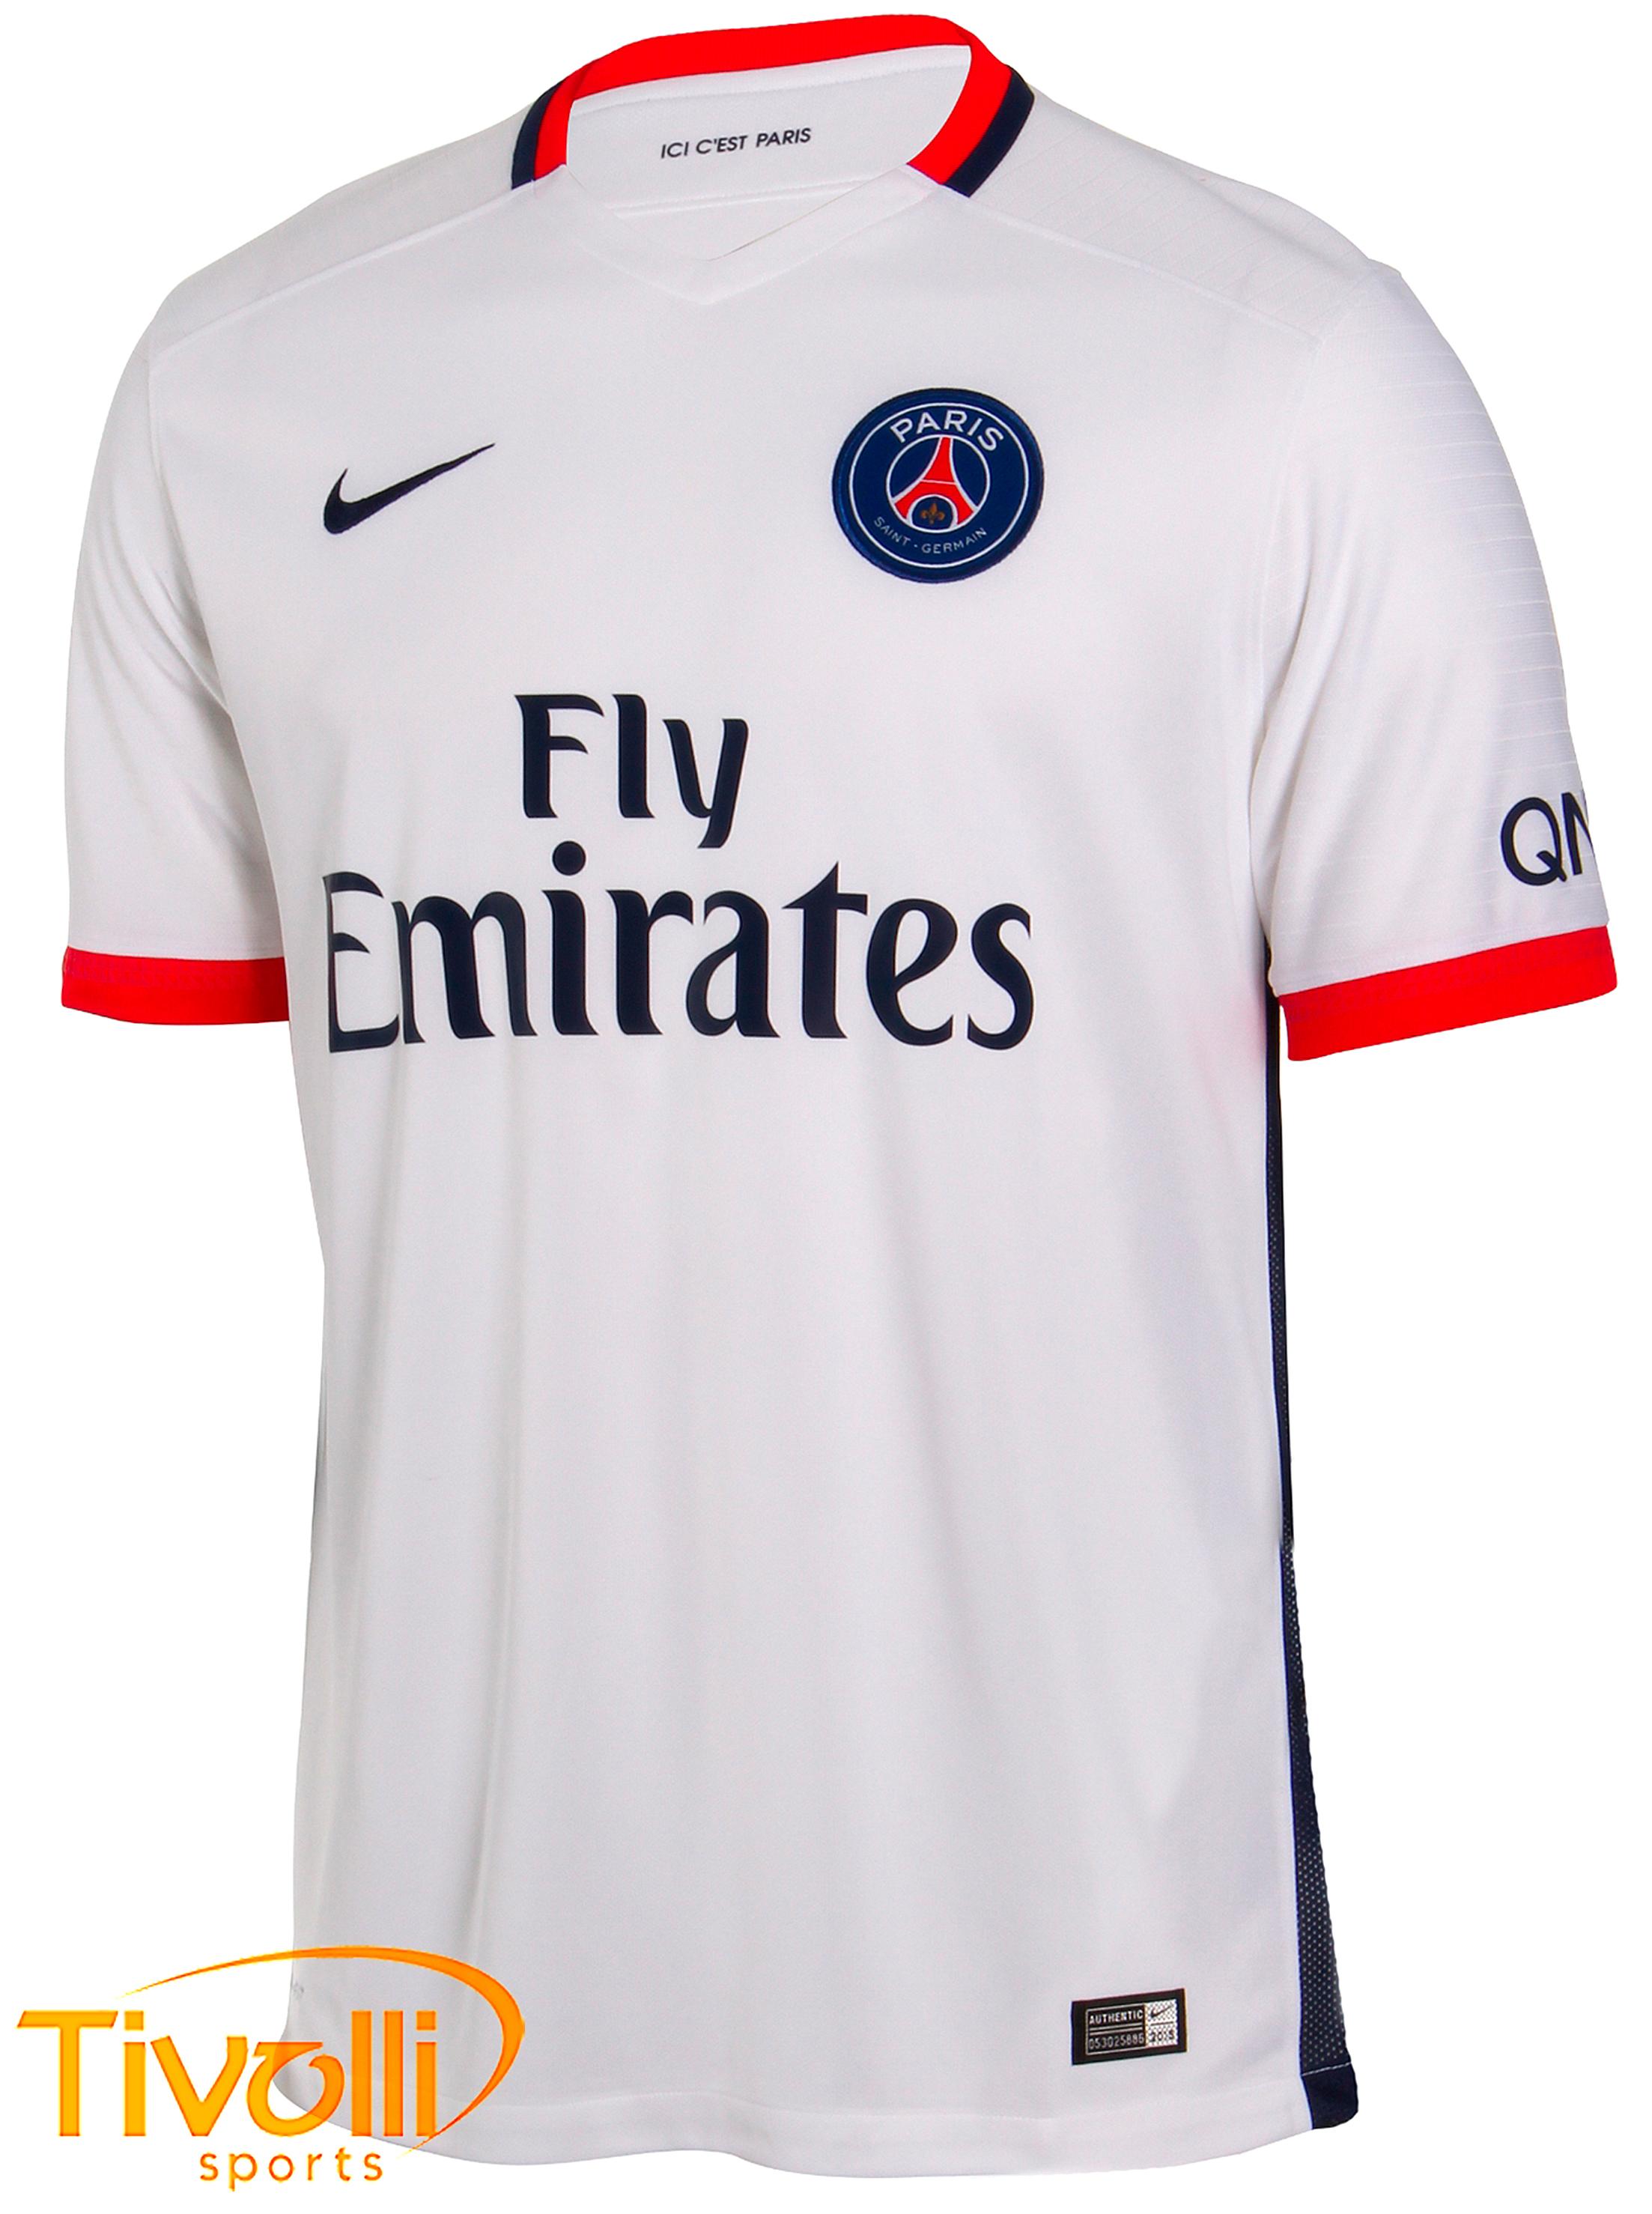 8f369b6614 Camisa Paris Saint Germain II Nike   - Mega Saldão